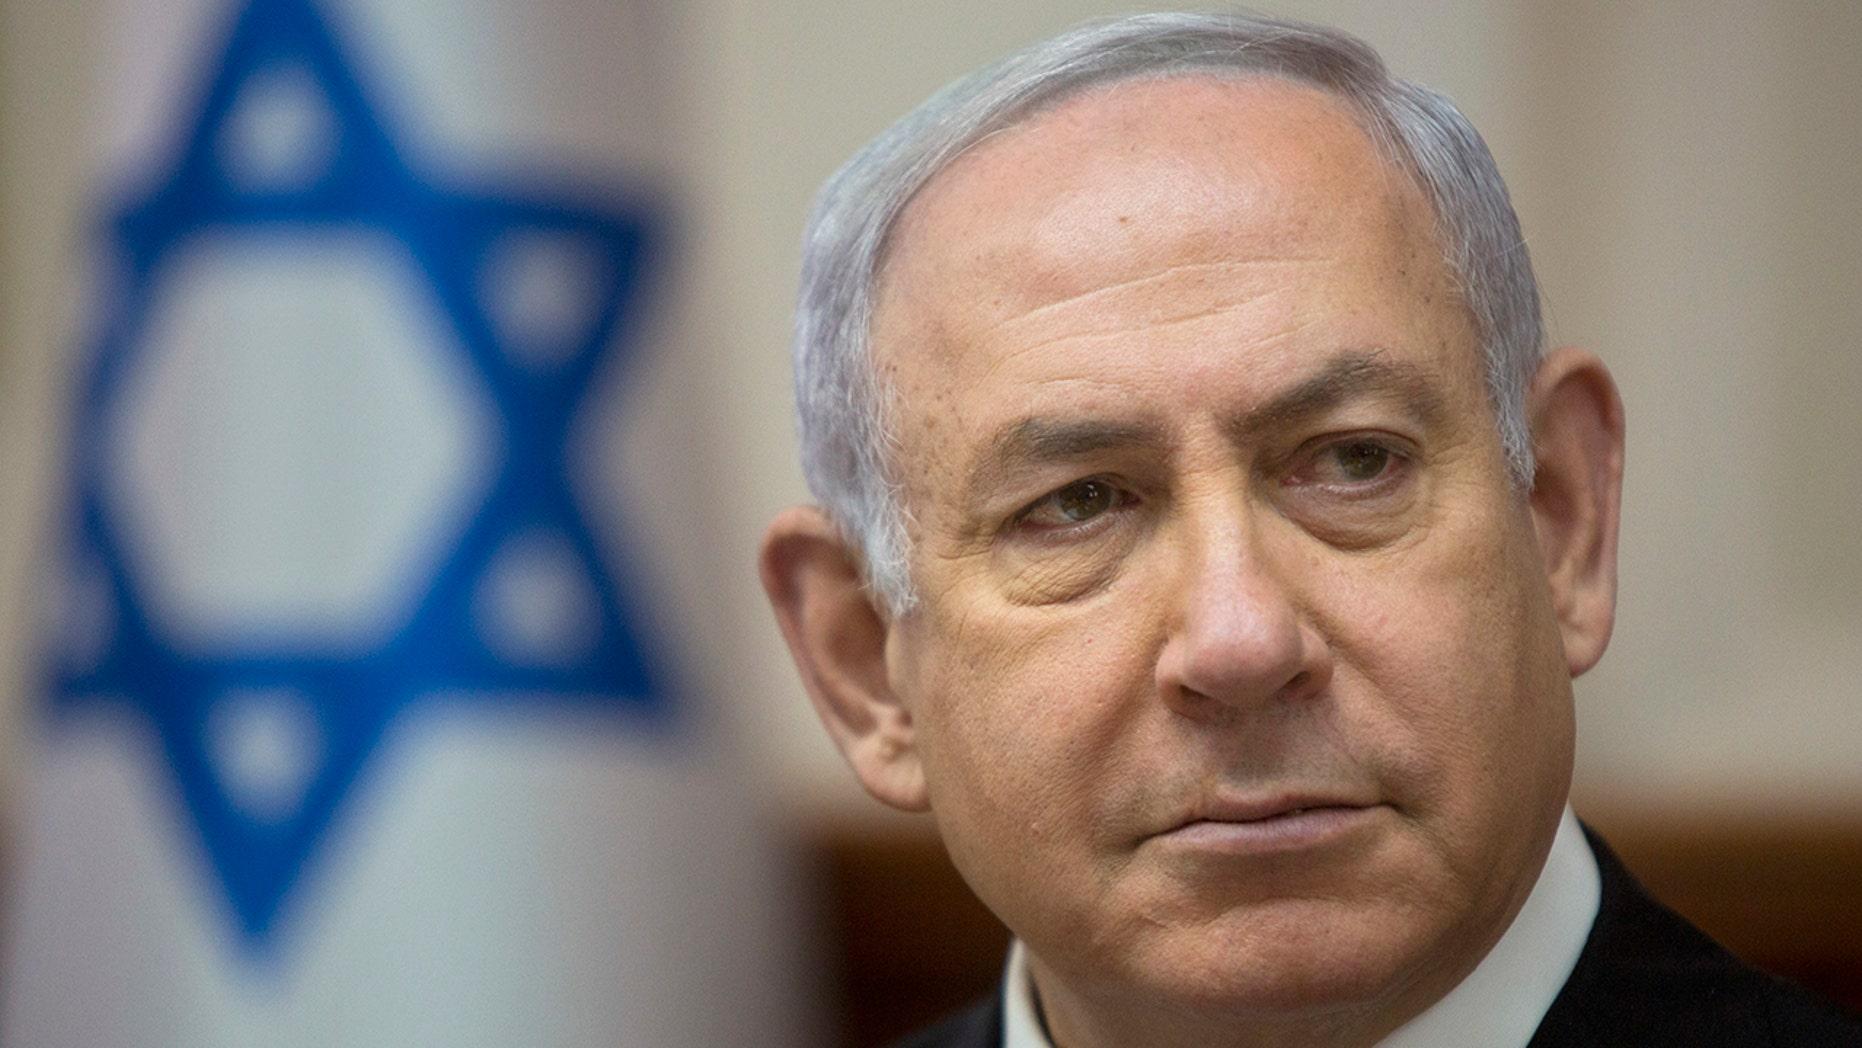 Westlake Legal Group Benjamin-Netanyahu-AP Netanyahu says if re-elected he will extend Israeli sovereignty over West Bank Talia Kaplan fox-news/world/world-regions/israel fox-news/world/world-regions fox-news/topic/fox-news-flash fox-news/person/donald-trump fox-news/person/benjamin-netanyahu fox news fnc/world fnc article 393817da-59e8-5de7-9a16-bd6cee1d1e4a